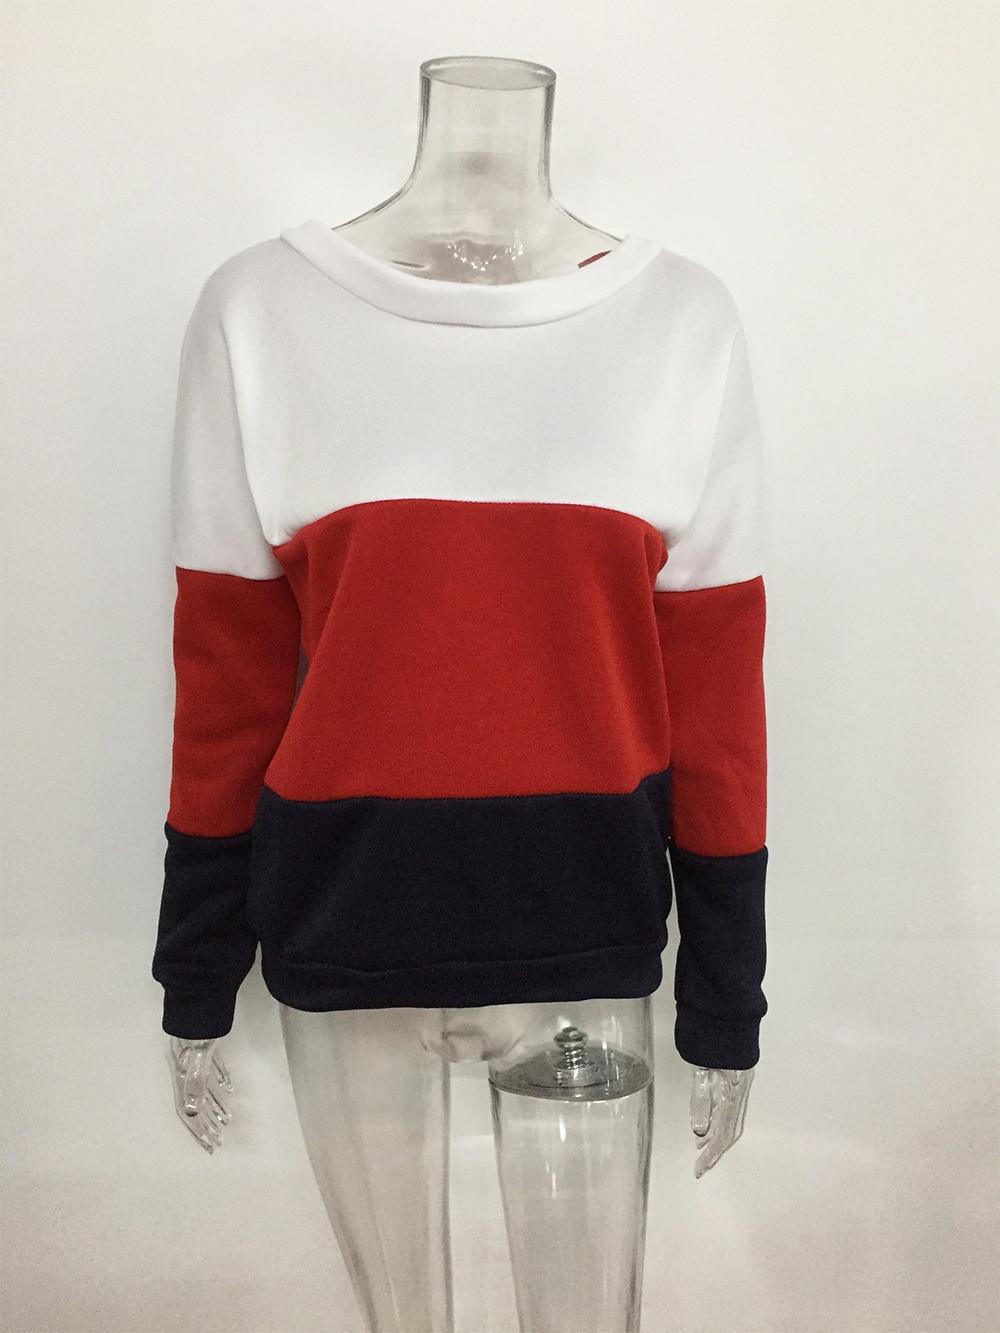 Patchwork White Hoodies Sweatshirts EuropeTops 2020 Women Casual Kawaii Harajuku Kpop Sweat Punk For Girls Clothing Korean